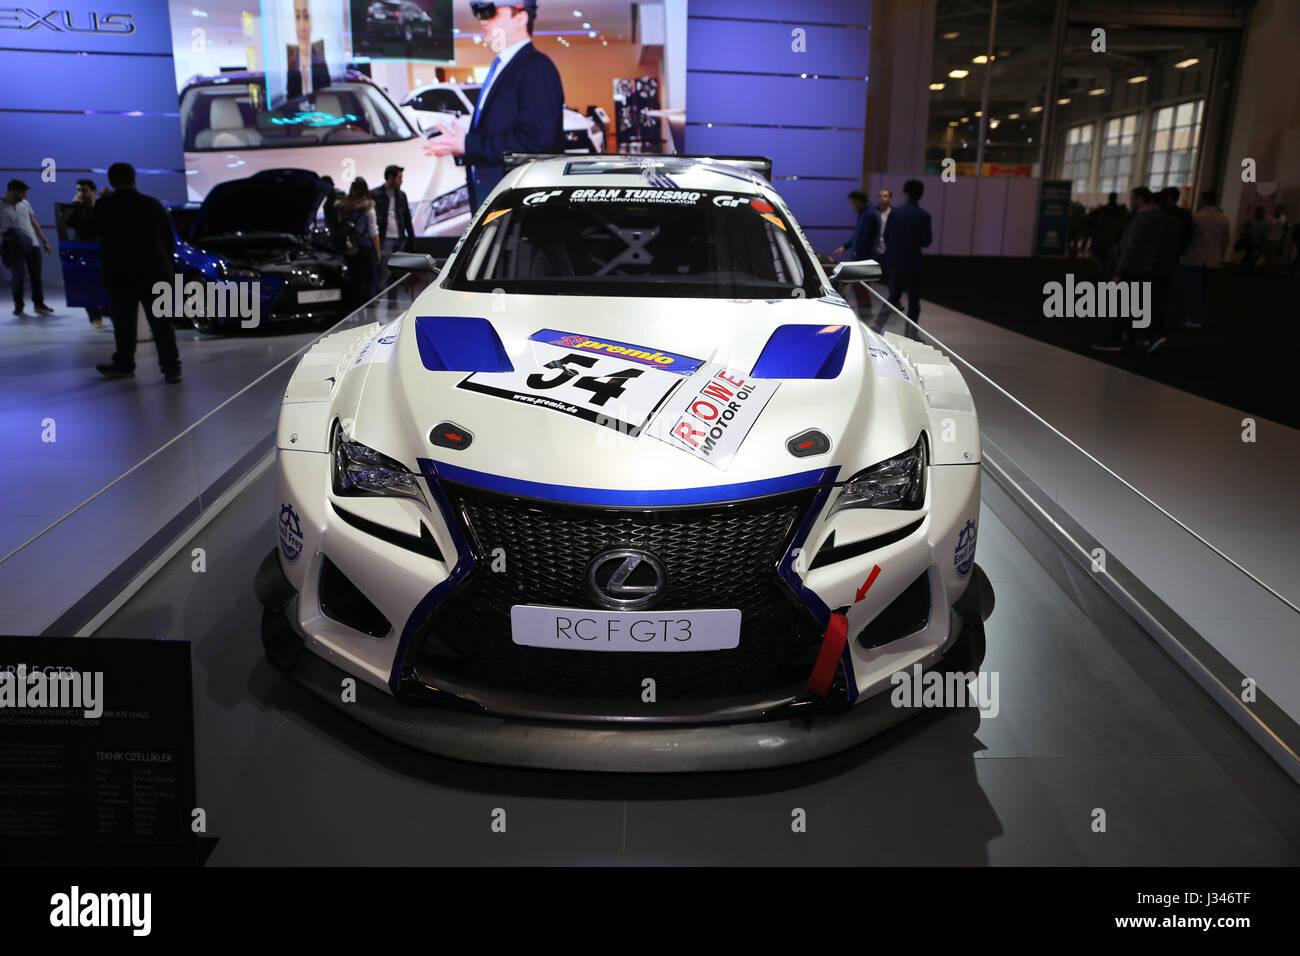 http://c8.alamy.com/comp/J346TF/istanbul-turkey-april-22-2017-lexus-rc-f-gt3-on-display-at-autoshow-J346TF.jpg